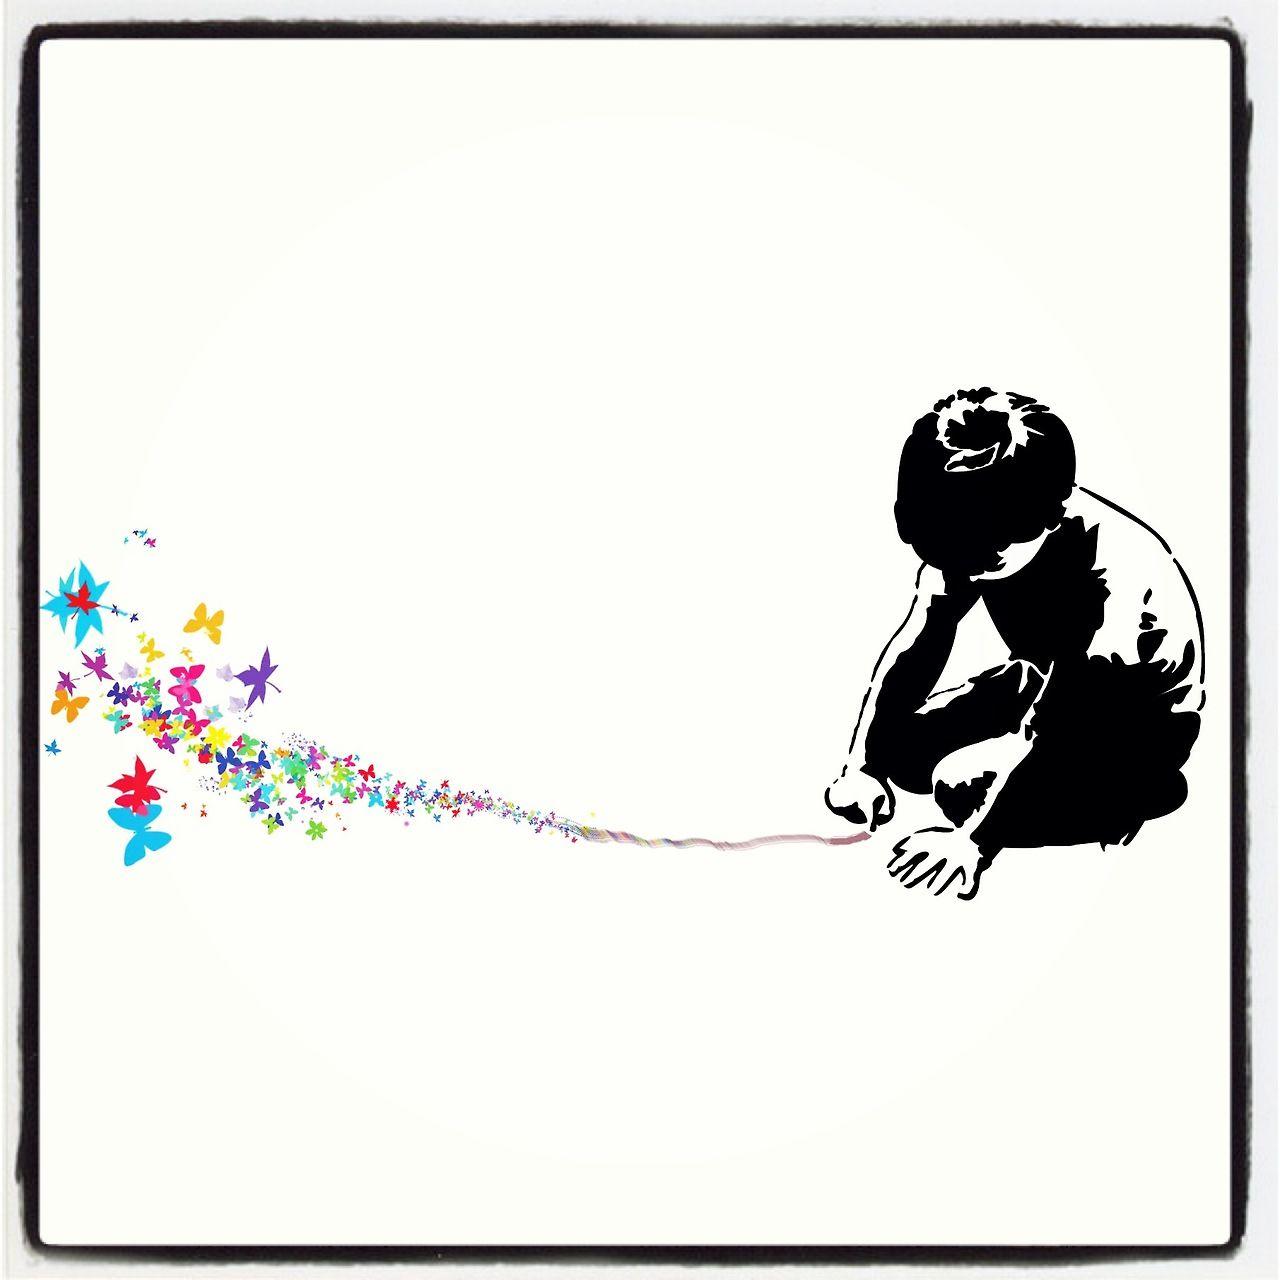 Spring Kid. #illustration #illustrator #ilustracion #dessin #diseño #design #colores #coleurs #colors #dibujo #draw #vector